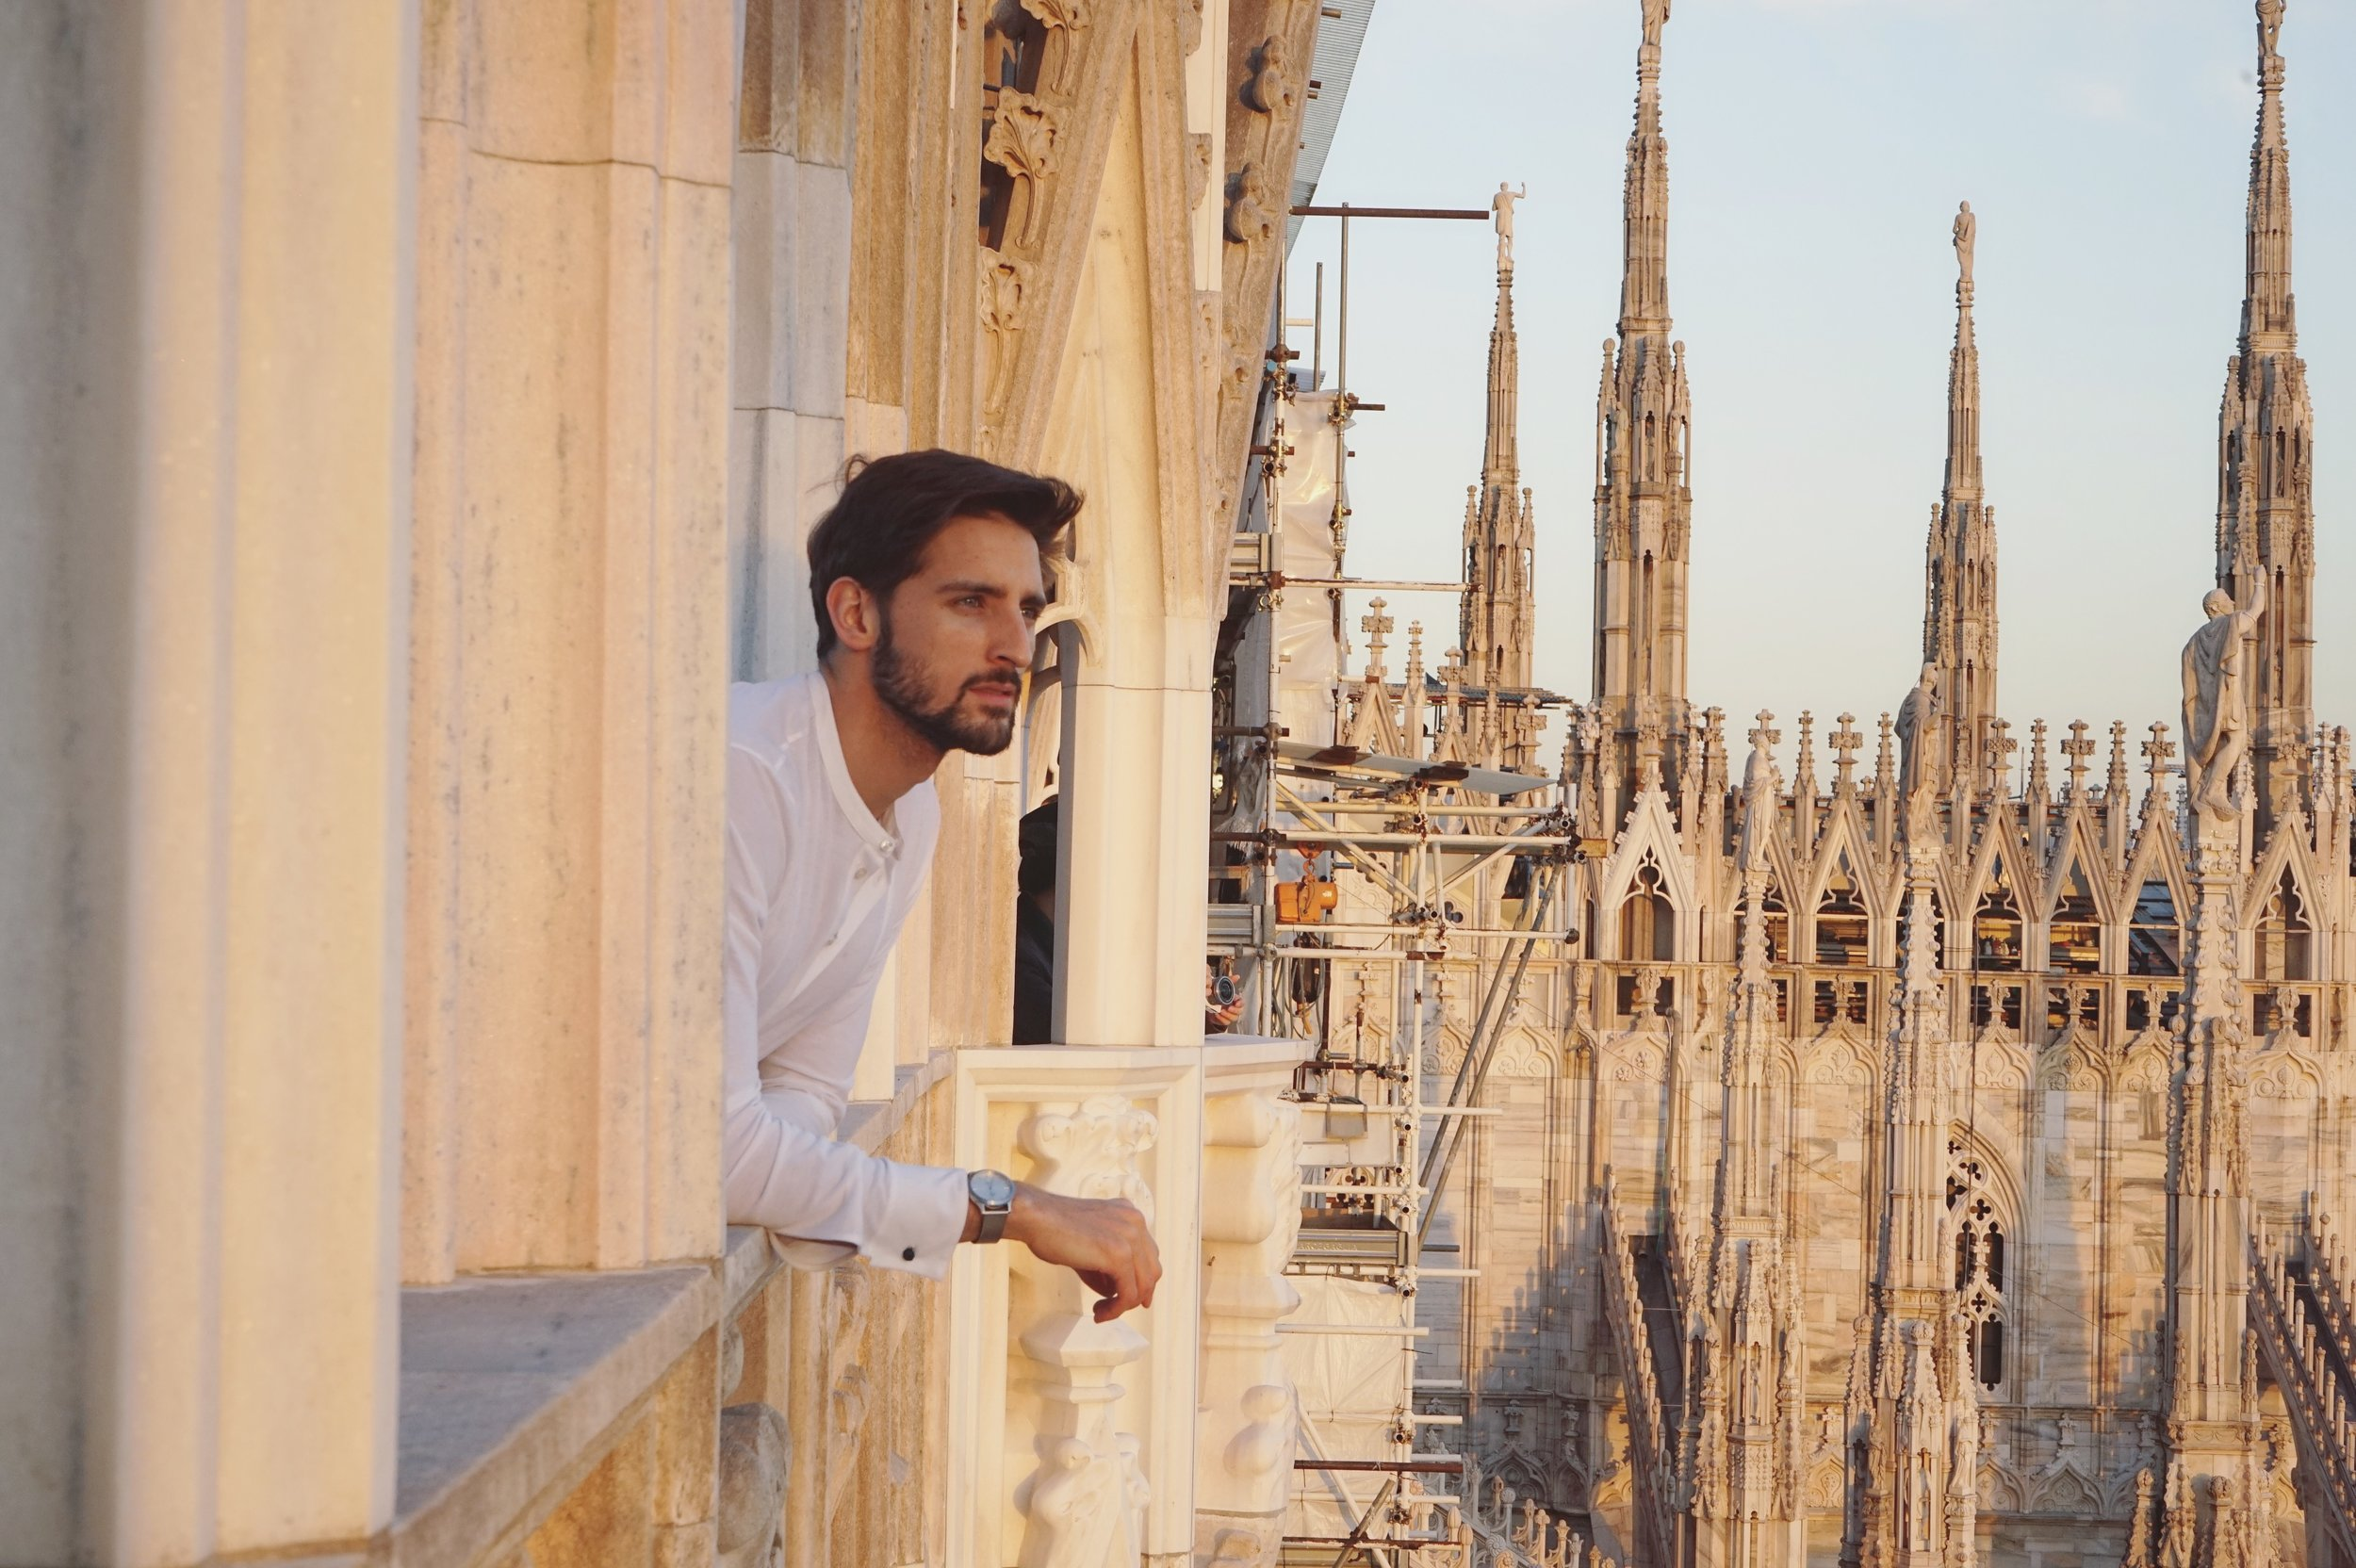 On Top Of Duomo next to the Clouds Model David topmodel lundin-09.jpg